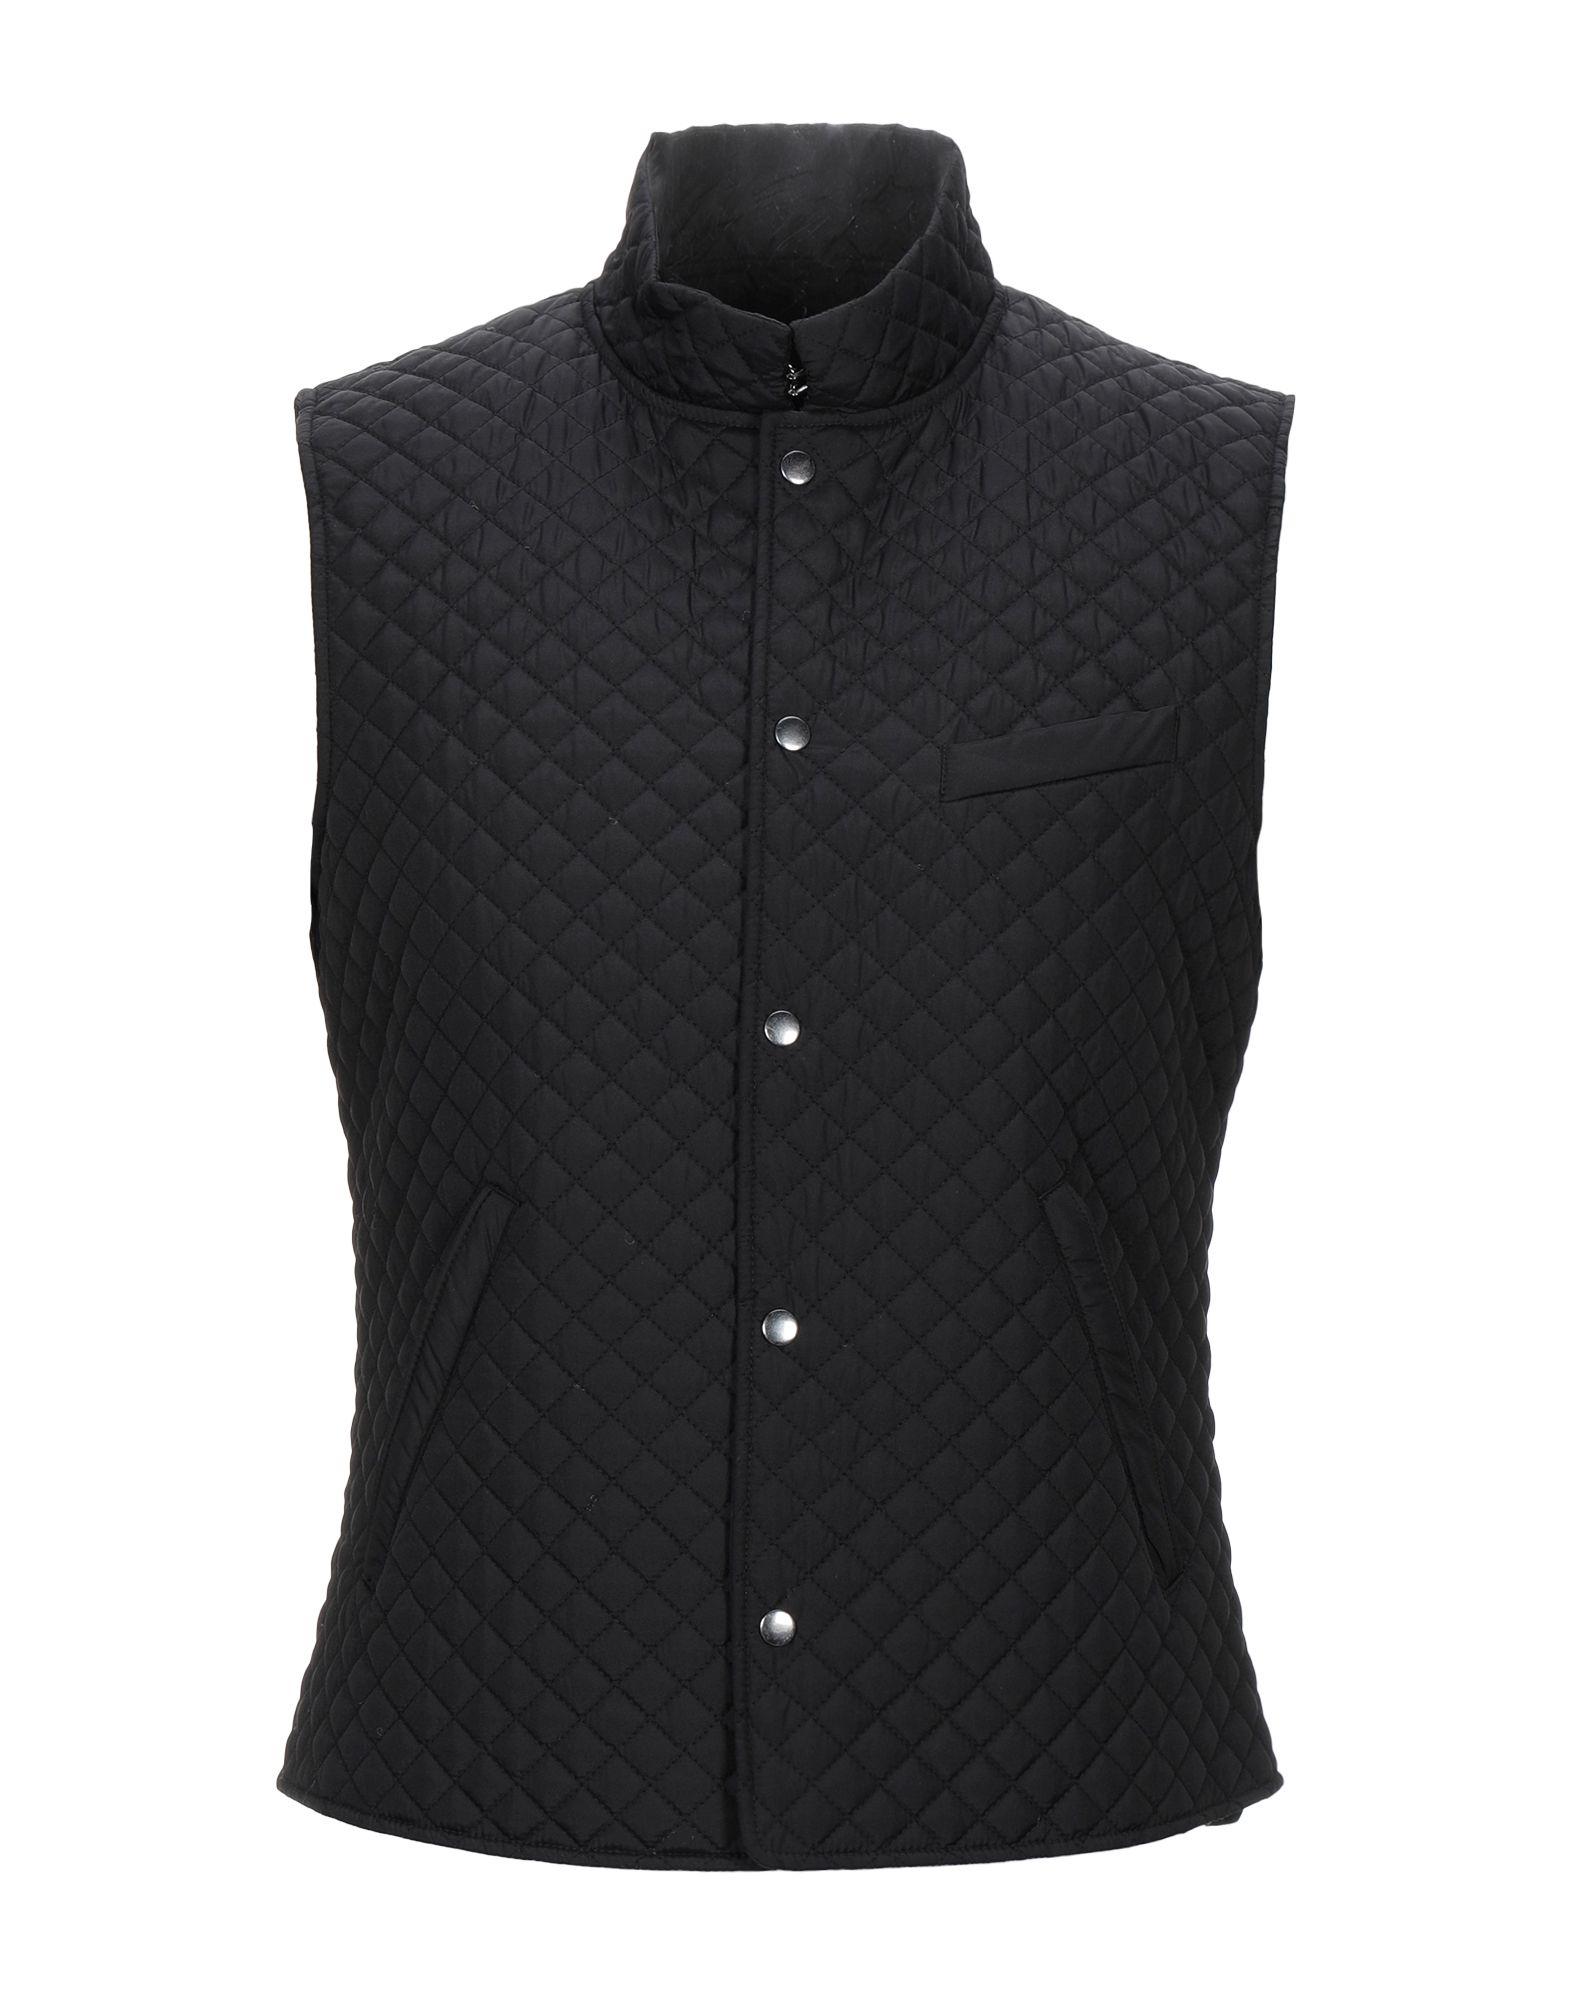 YOOX.COM(ユークス)《セール開催中》LIU? JO MAN メンズ 合成繊維中綿アウター ブラック S ポリエステル 100%